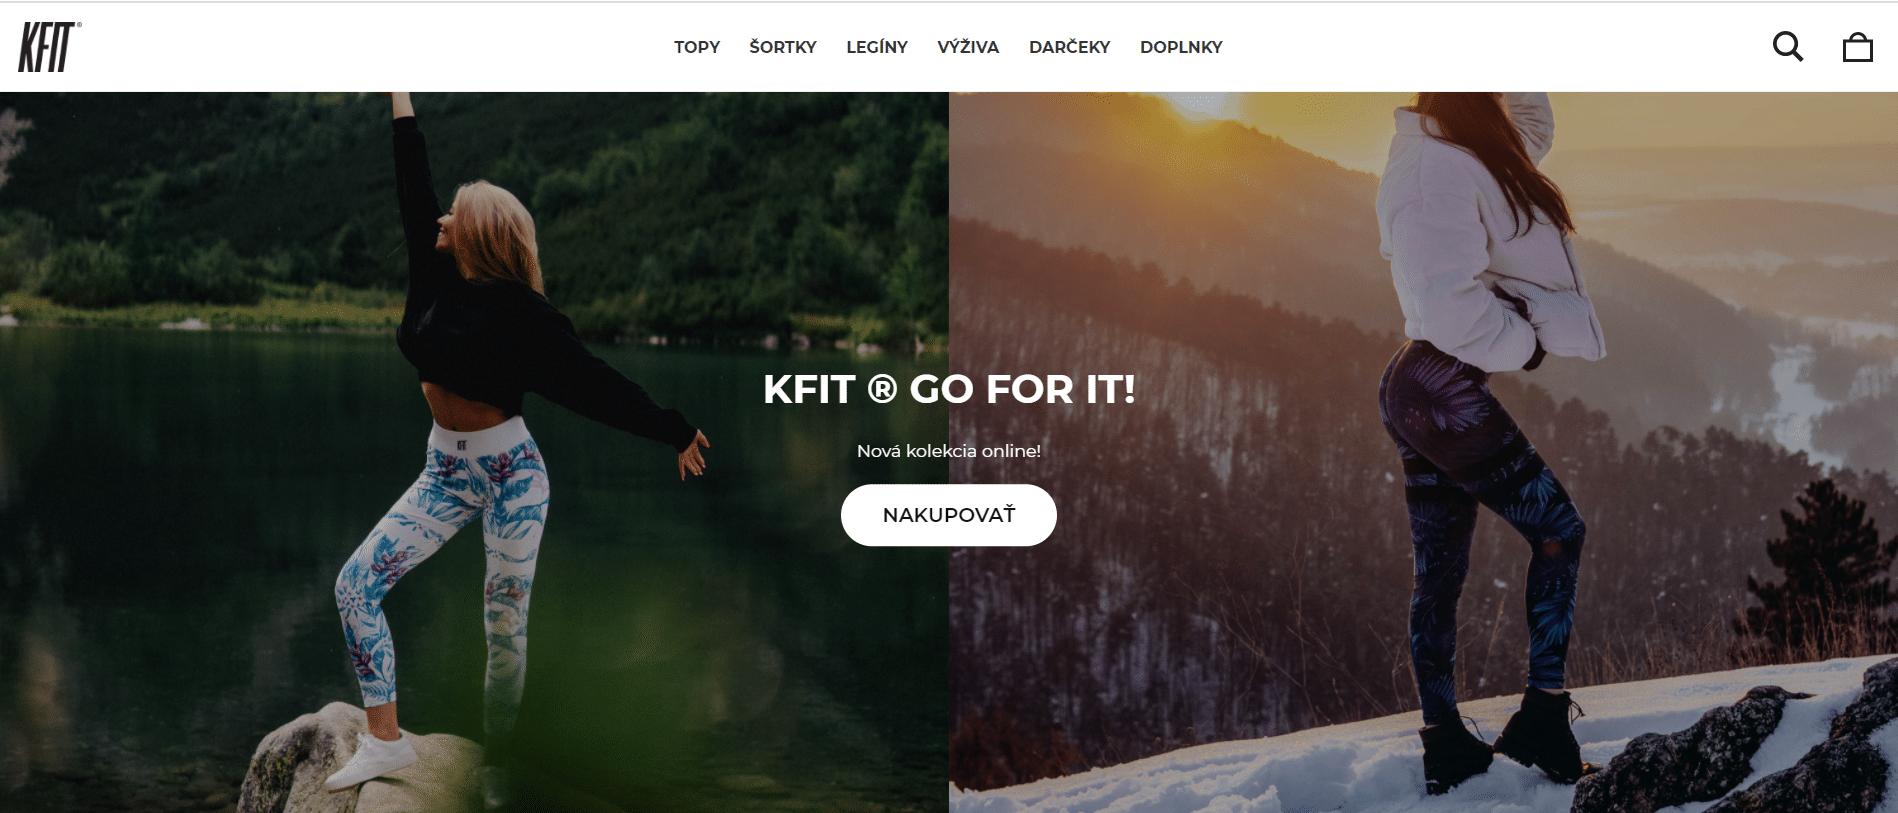 Klotinkfit-homepage